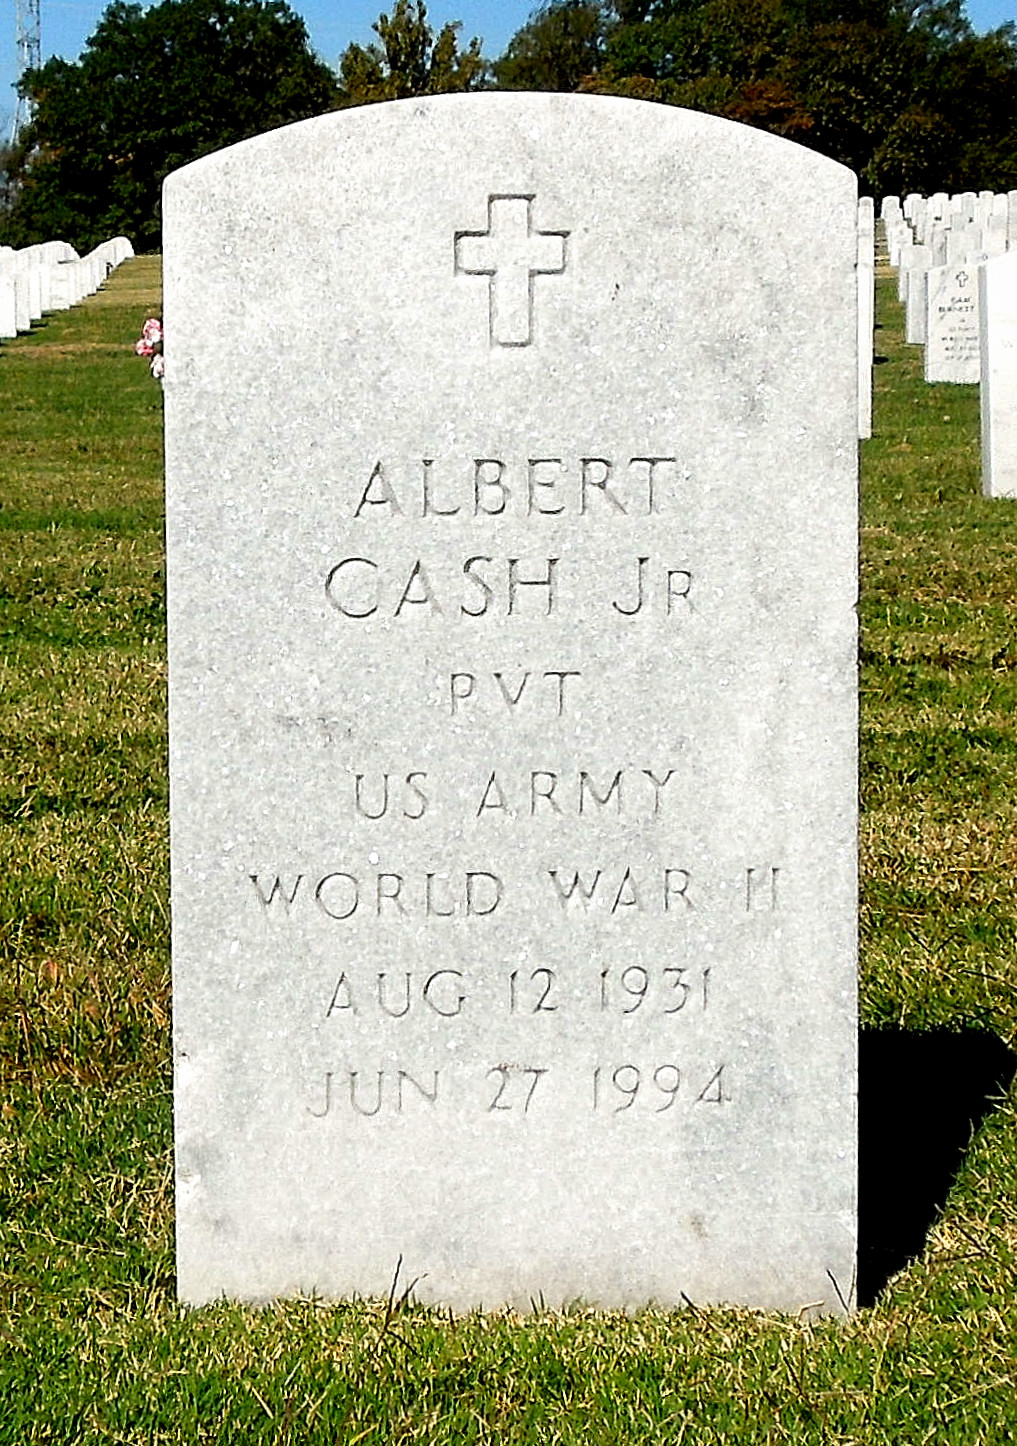 Albert Cash, Jr